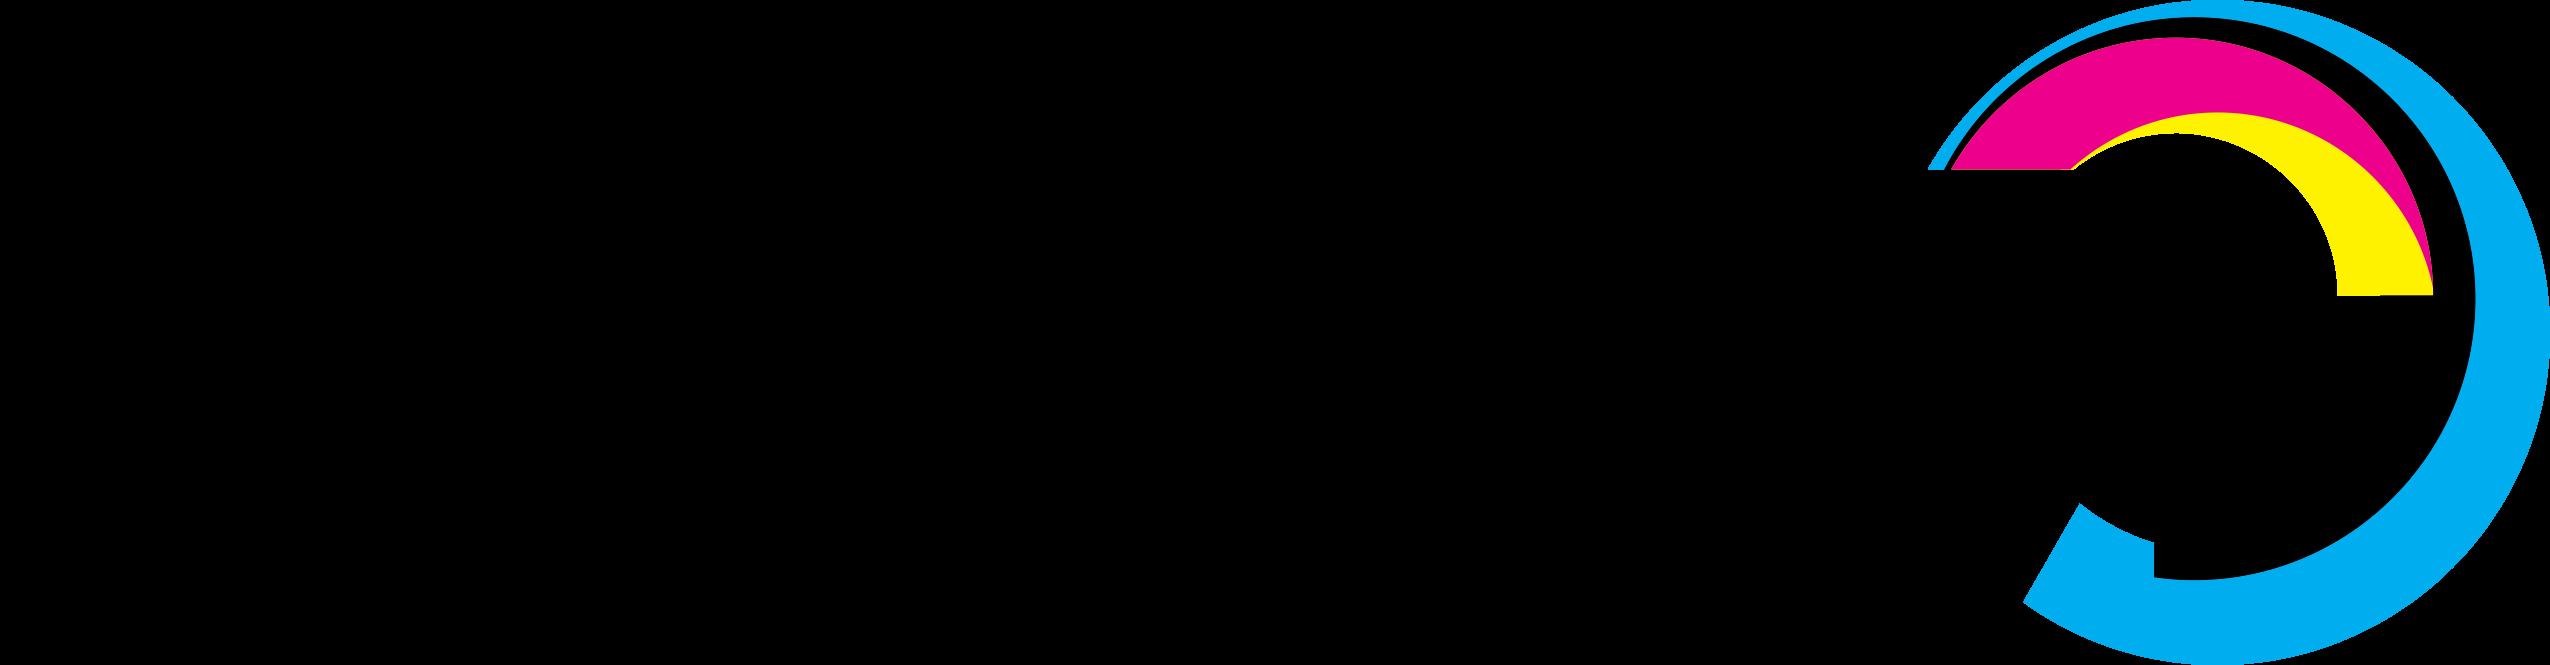 PRINTING United logo 2550x665